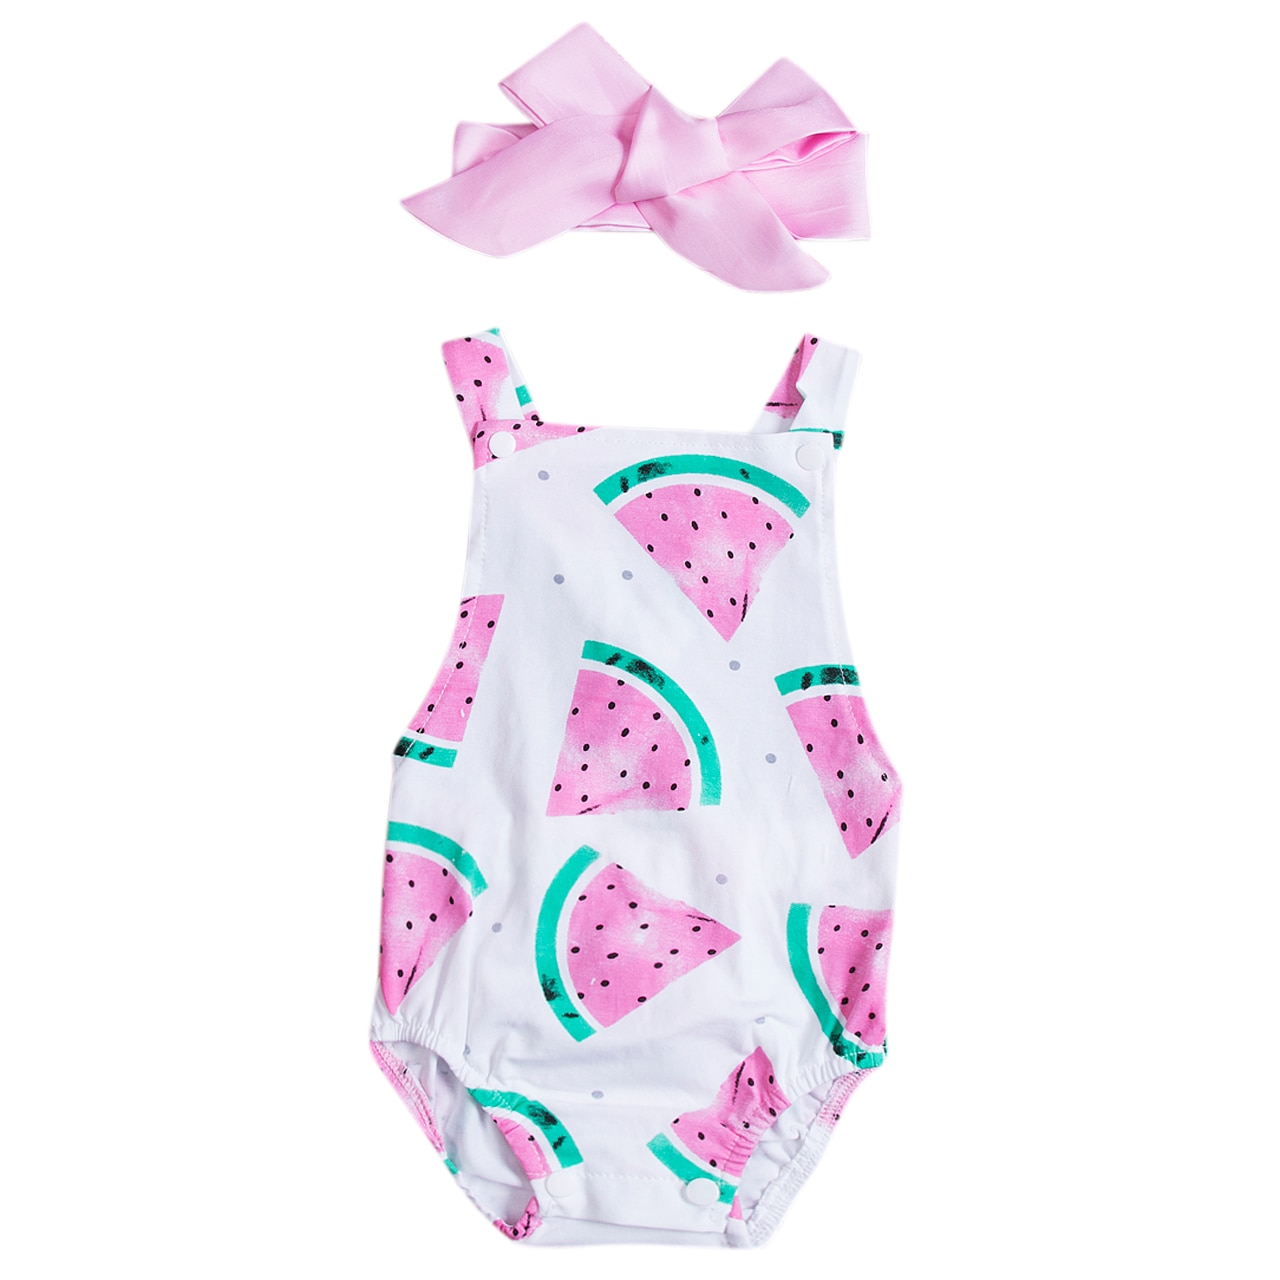 Sleeveless Watermelon Print Baby Romper with Headband For Baby Girl